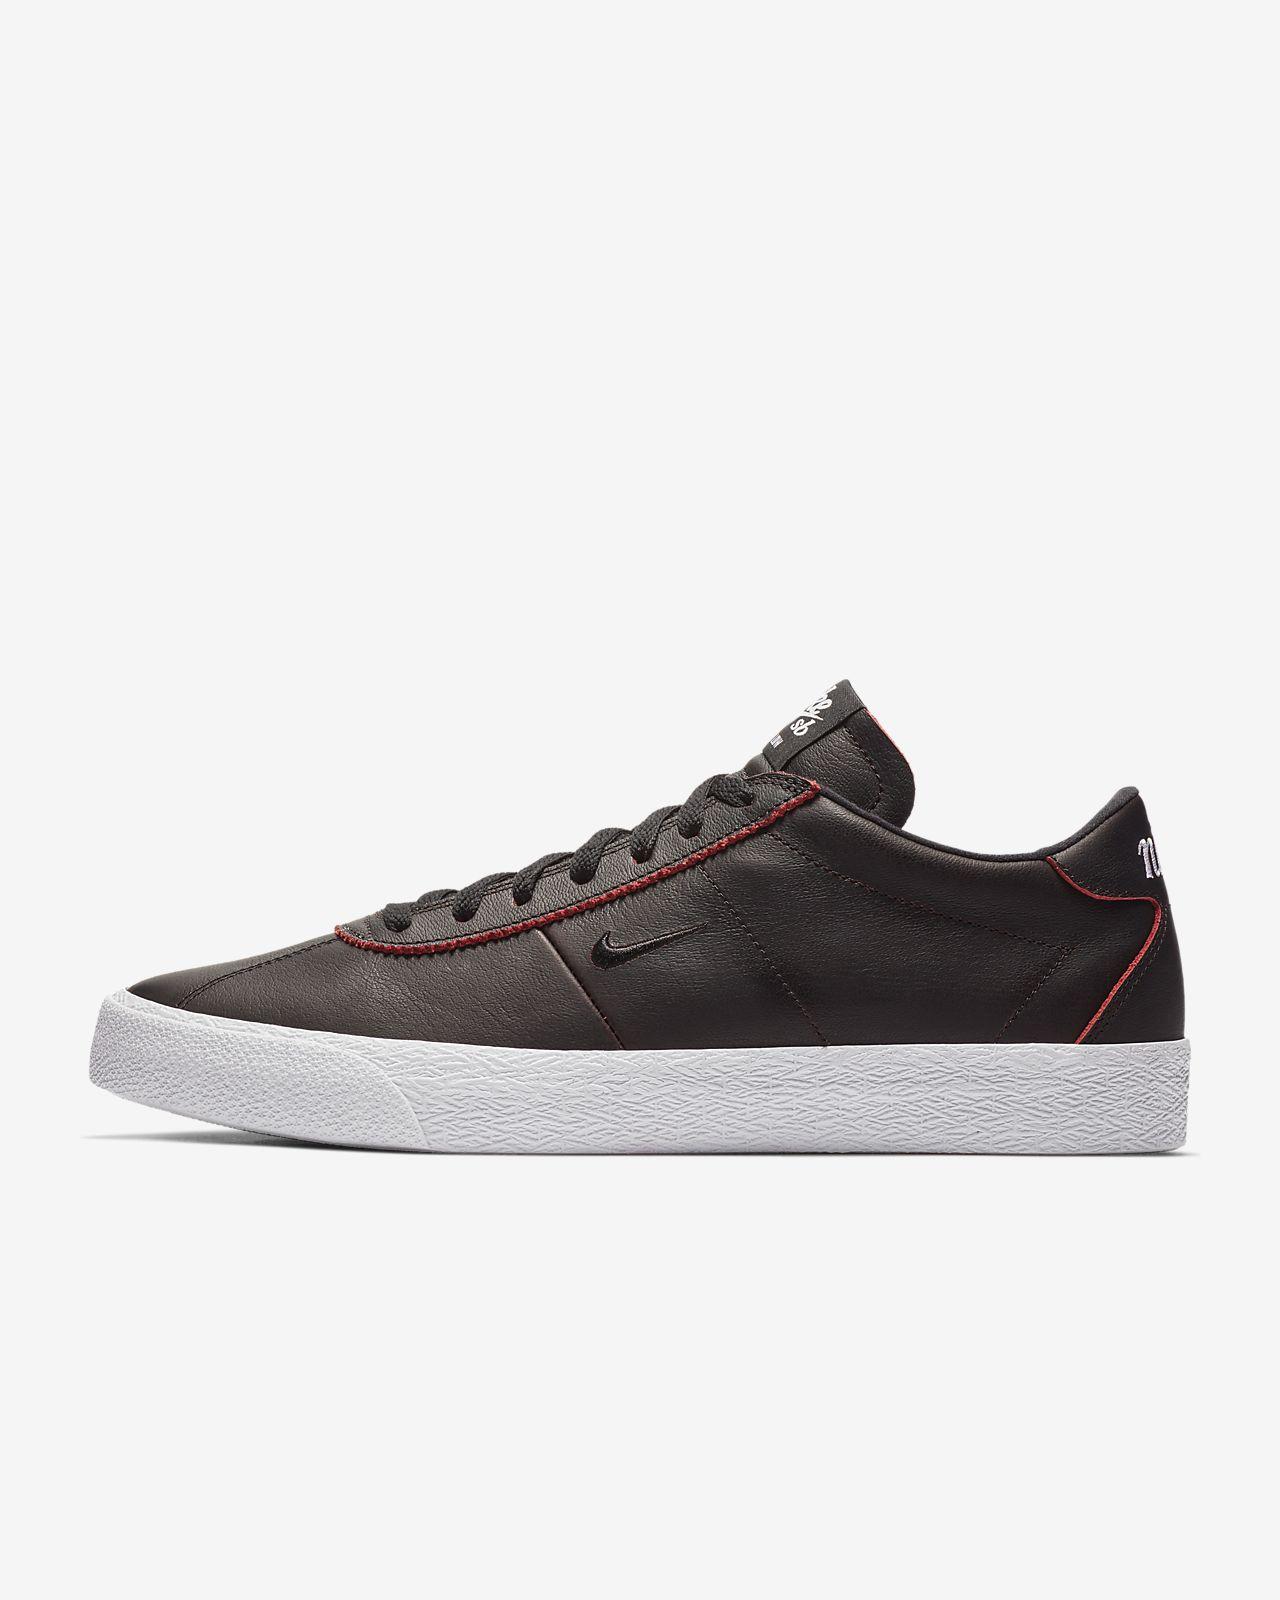 premium selection a1095 b1c8b Low Resolution Nike SB Zoom Bruin NBA Zapatillas de skateboard Nike SB Zoom  Bruin NBA Zapatillas de skateboard